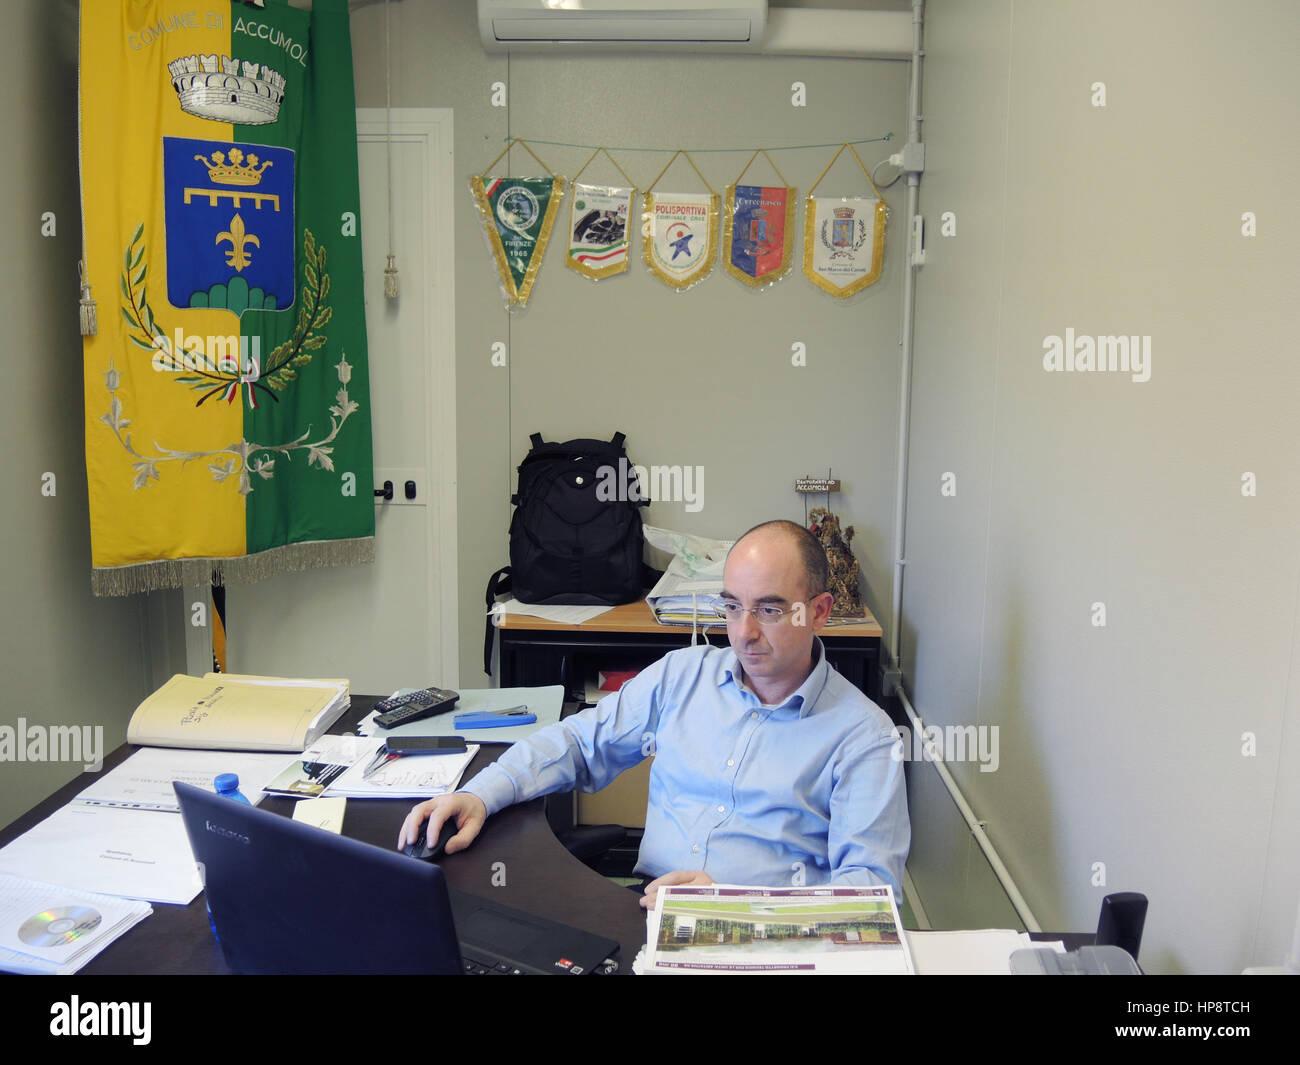 Accumoli, Italy. 16th Feb, 2017. Stefano Petrucci, mayor of the Accumoli municipality, sits in his makeshift office - Stock Image